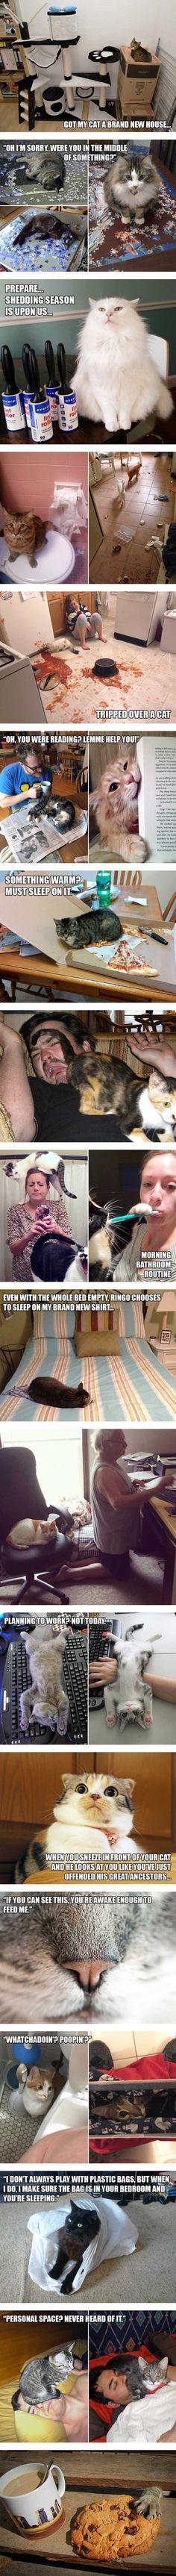 Cat owner struggles